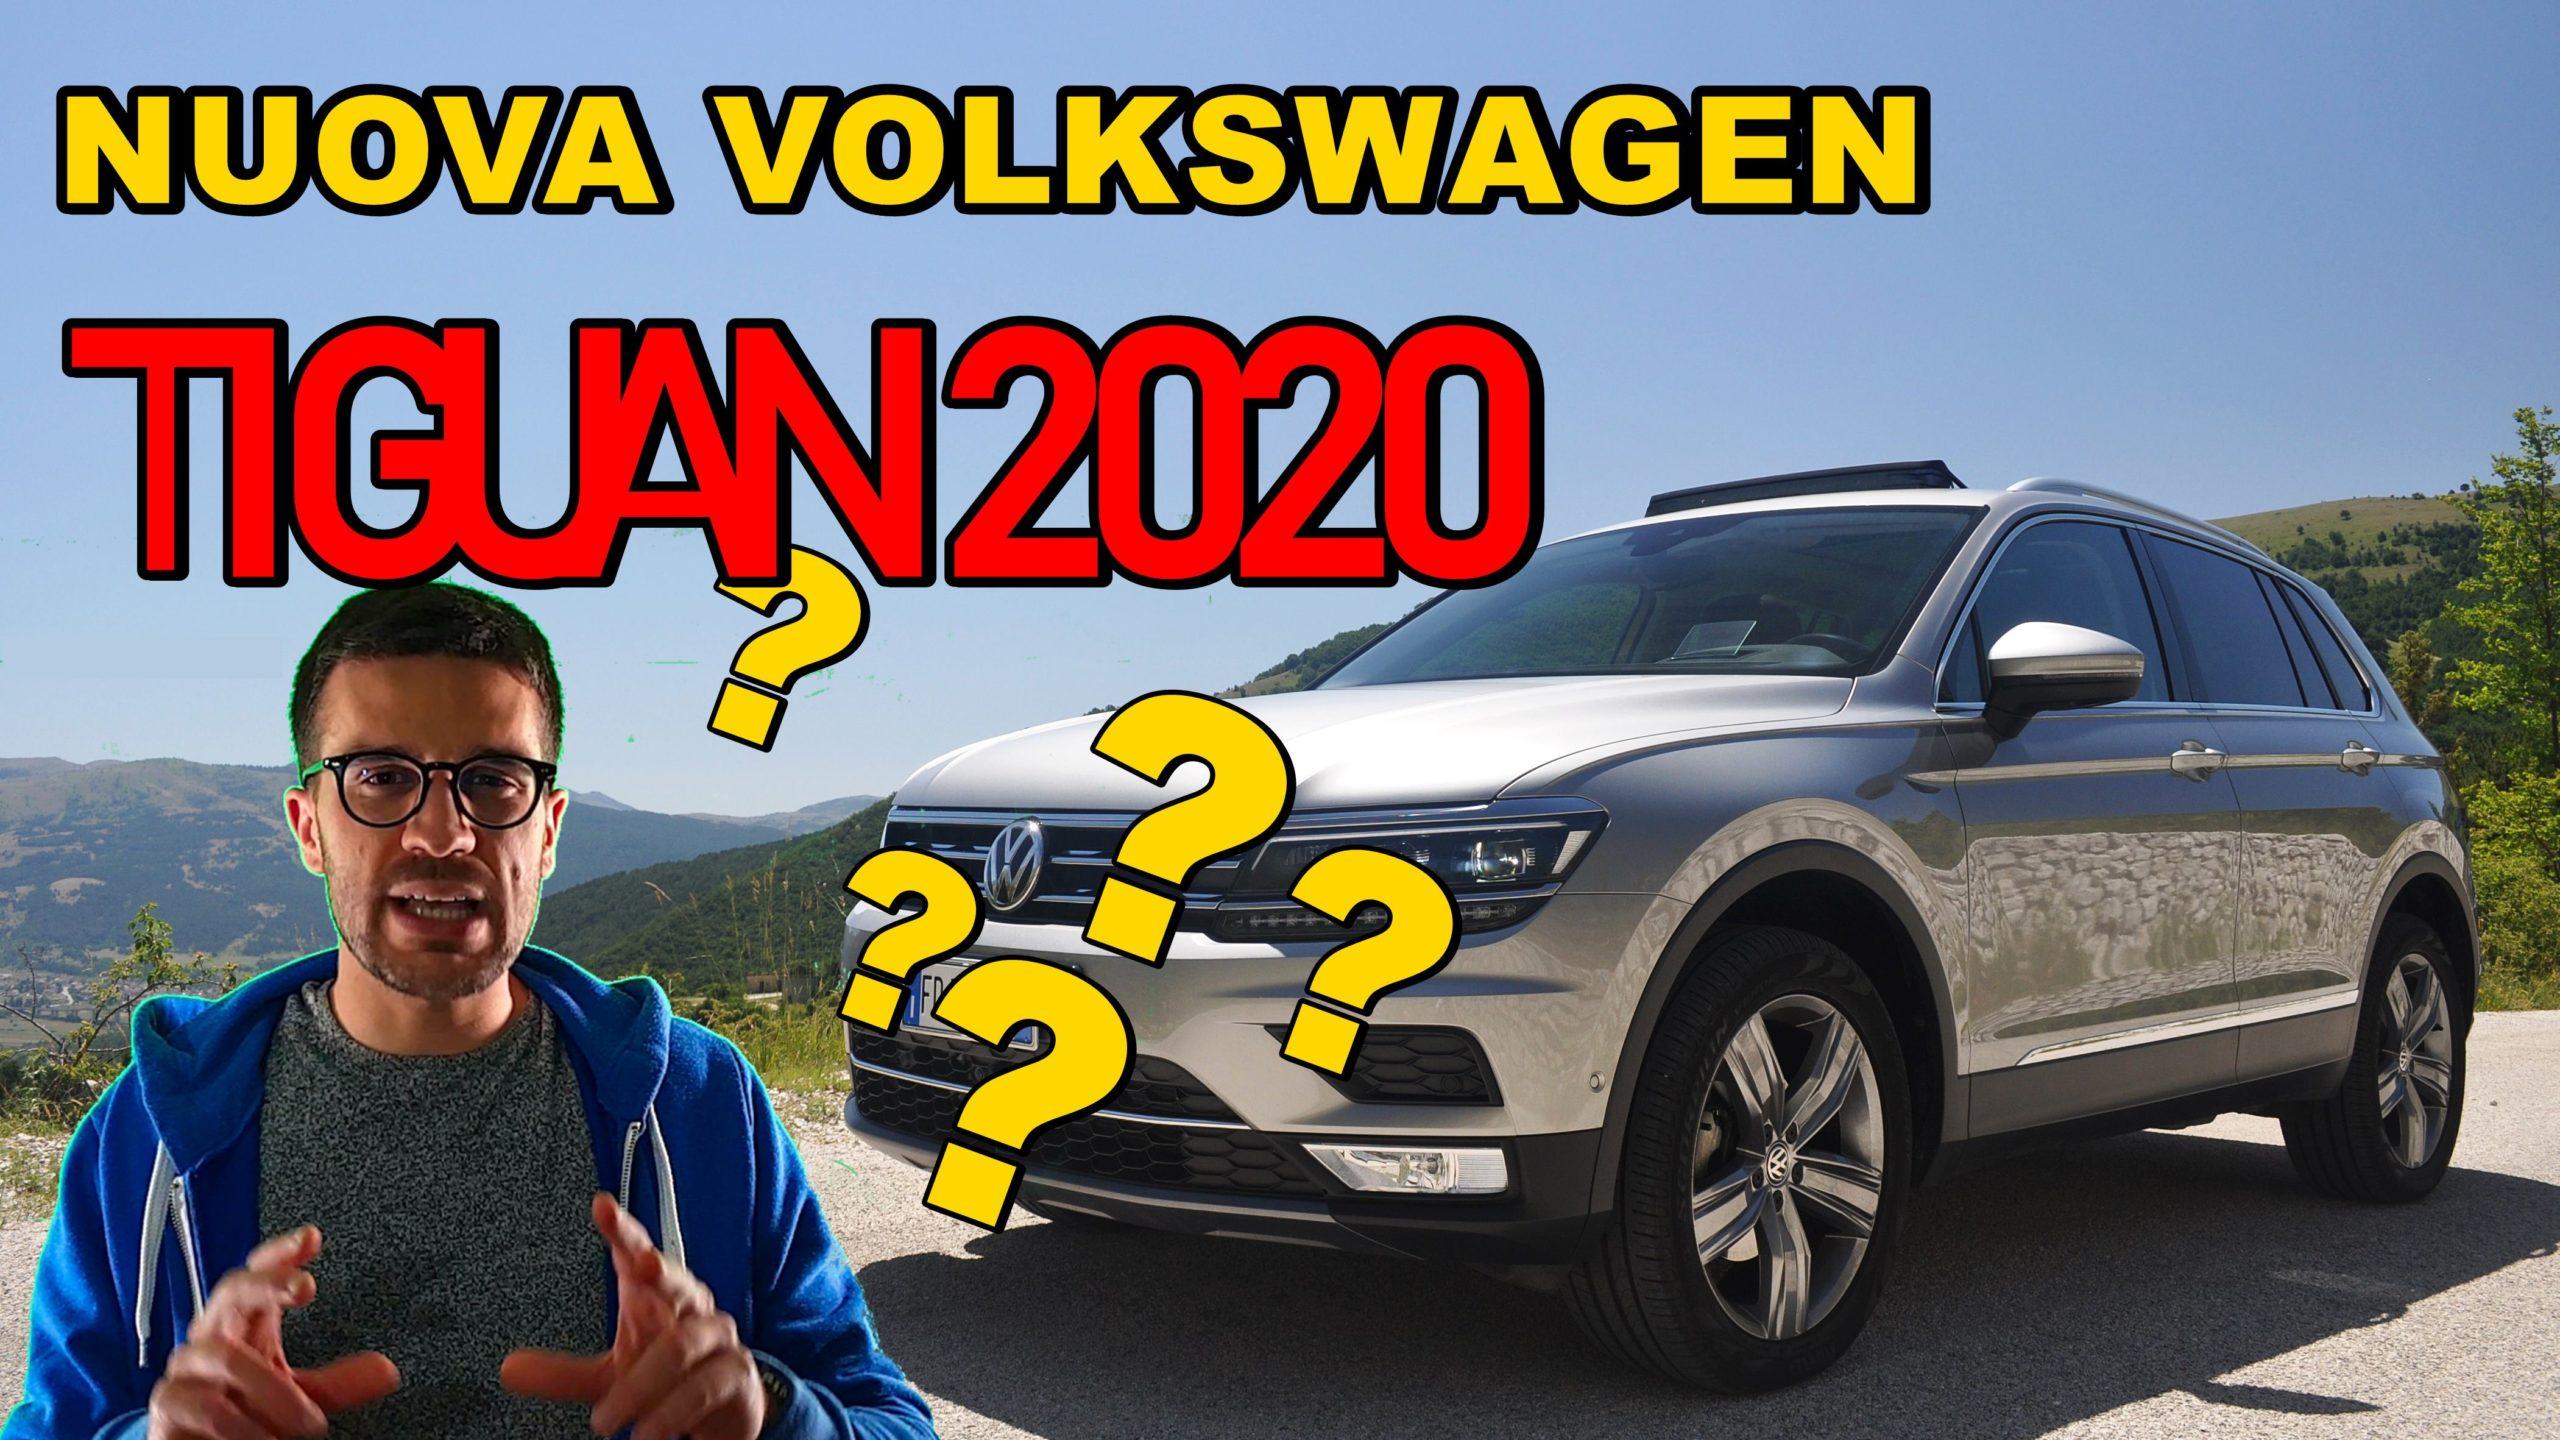 La nuova Volkswagen Tiguan 2020, storia della Bestseller VIDEO